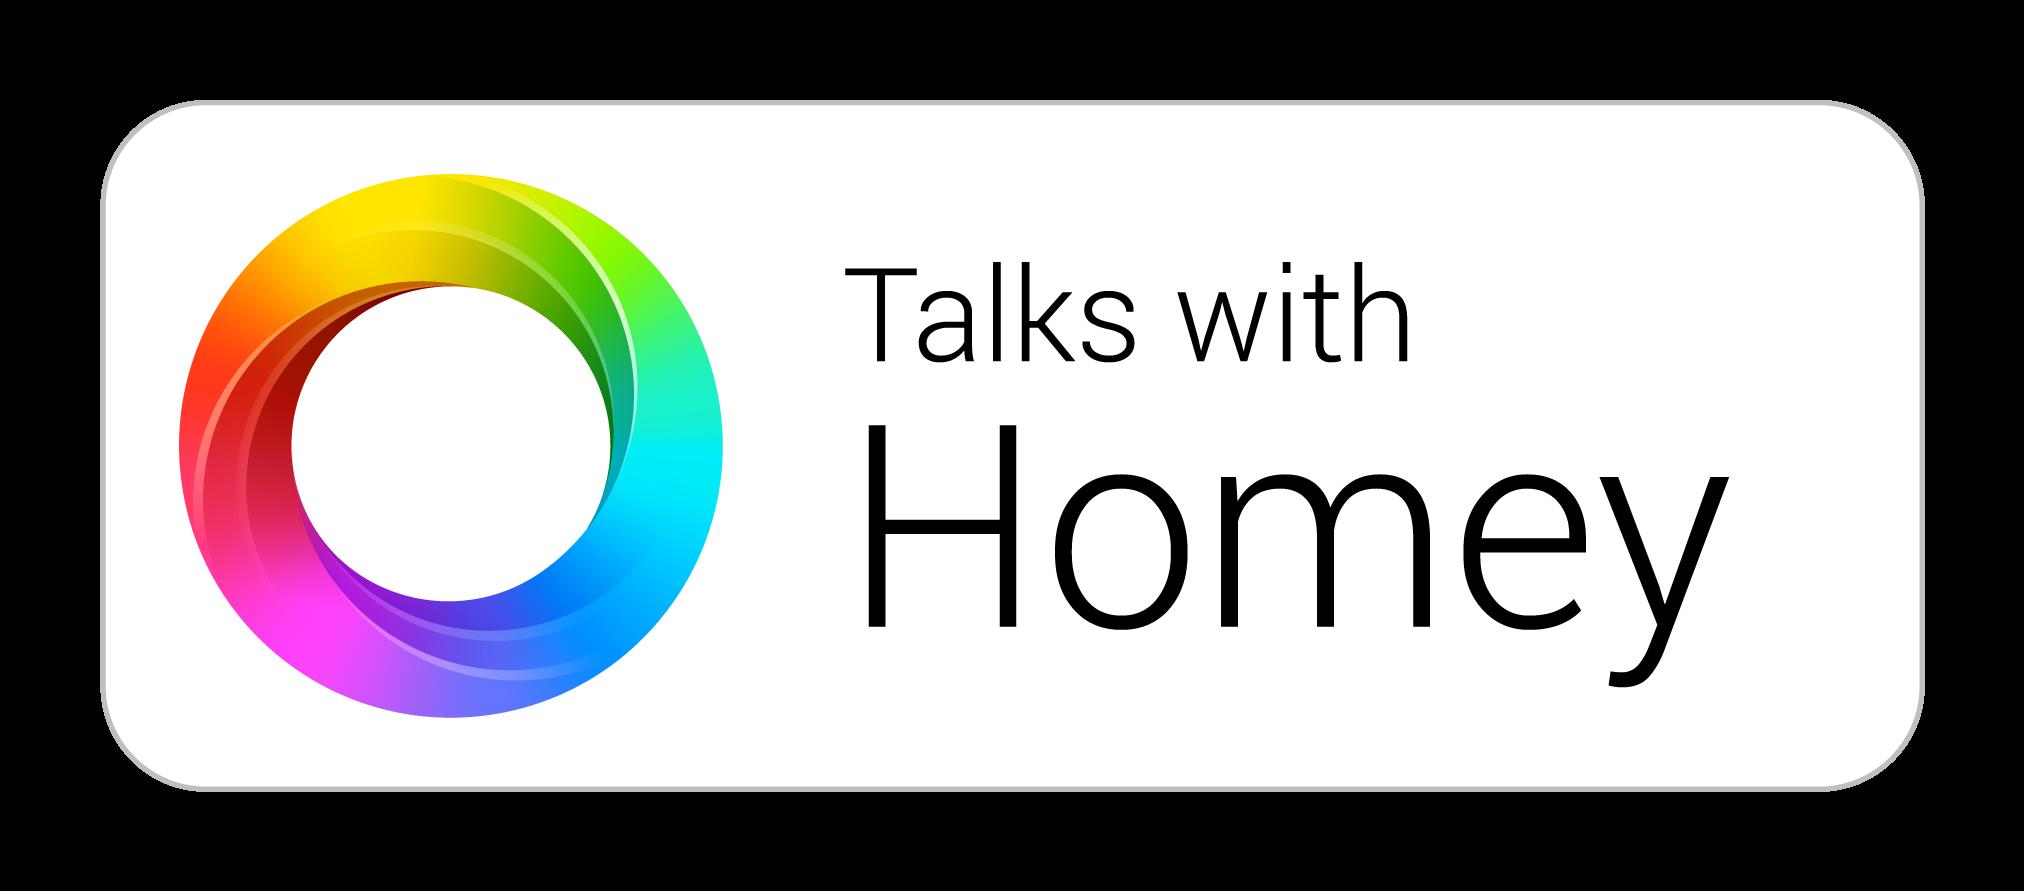 Talks with Homey logo